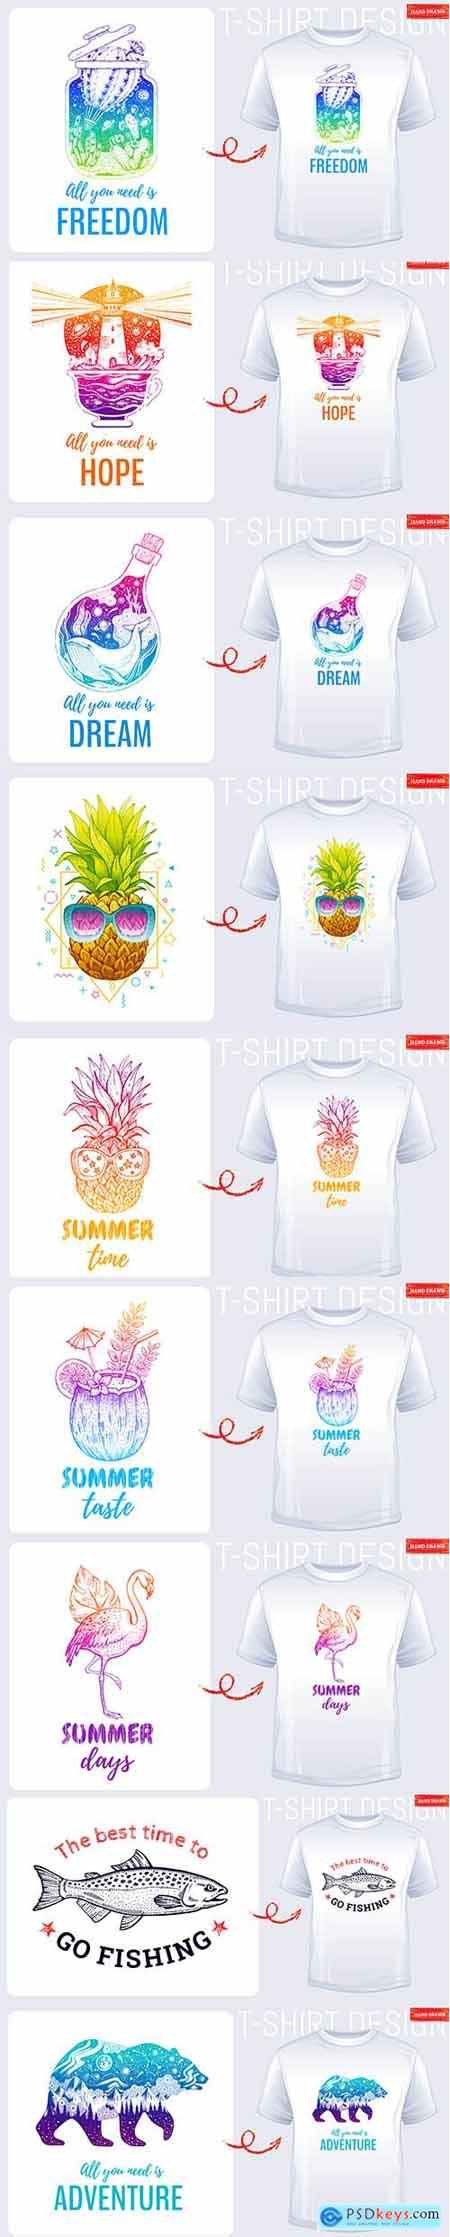 Summer T-shirt Print Illustration Collection